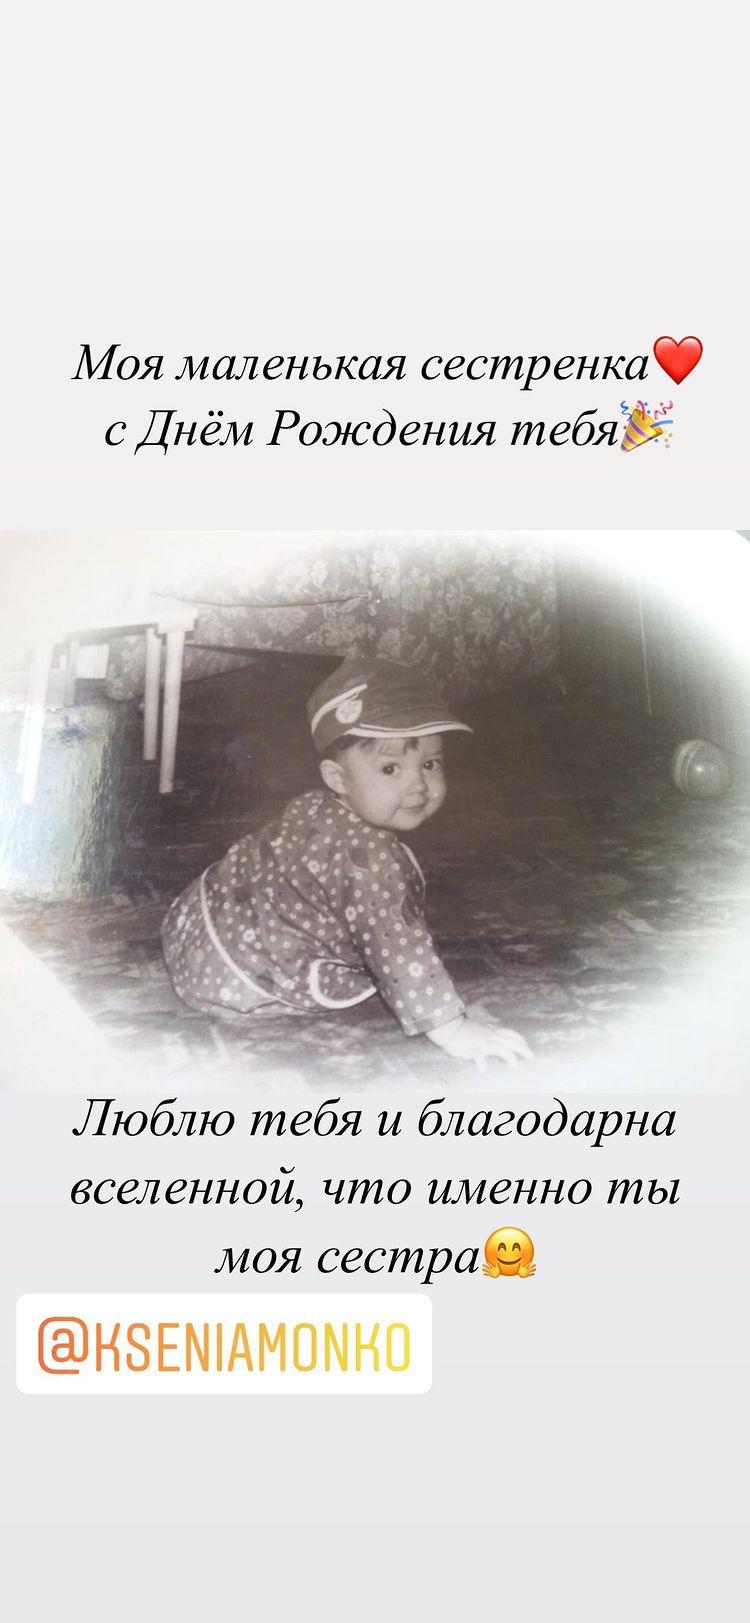 https://i5.imageban.ru/out/2021/02/08/ee3191f0e33f5f6a05c849c23d768cbf.jpg